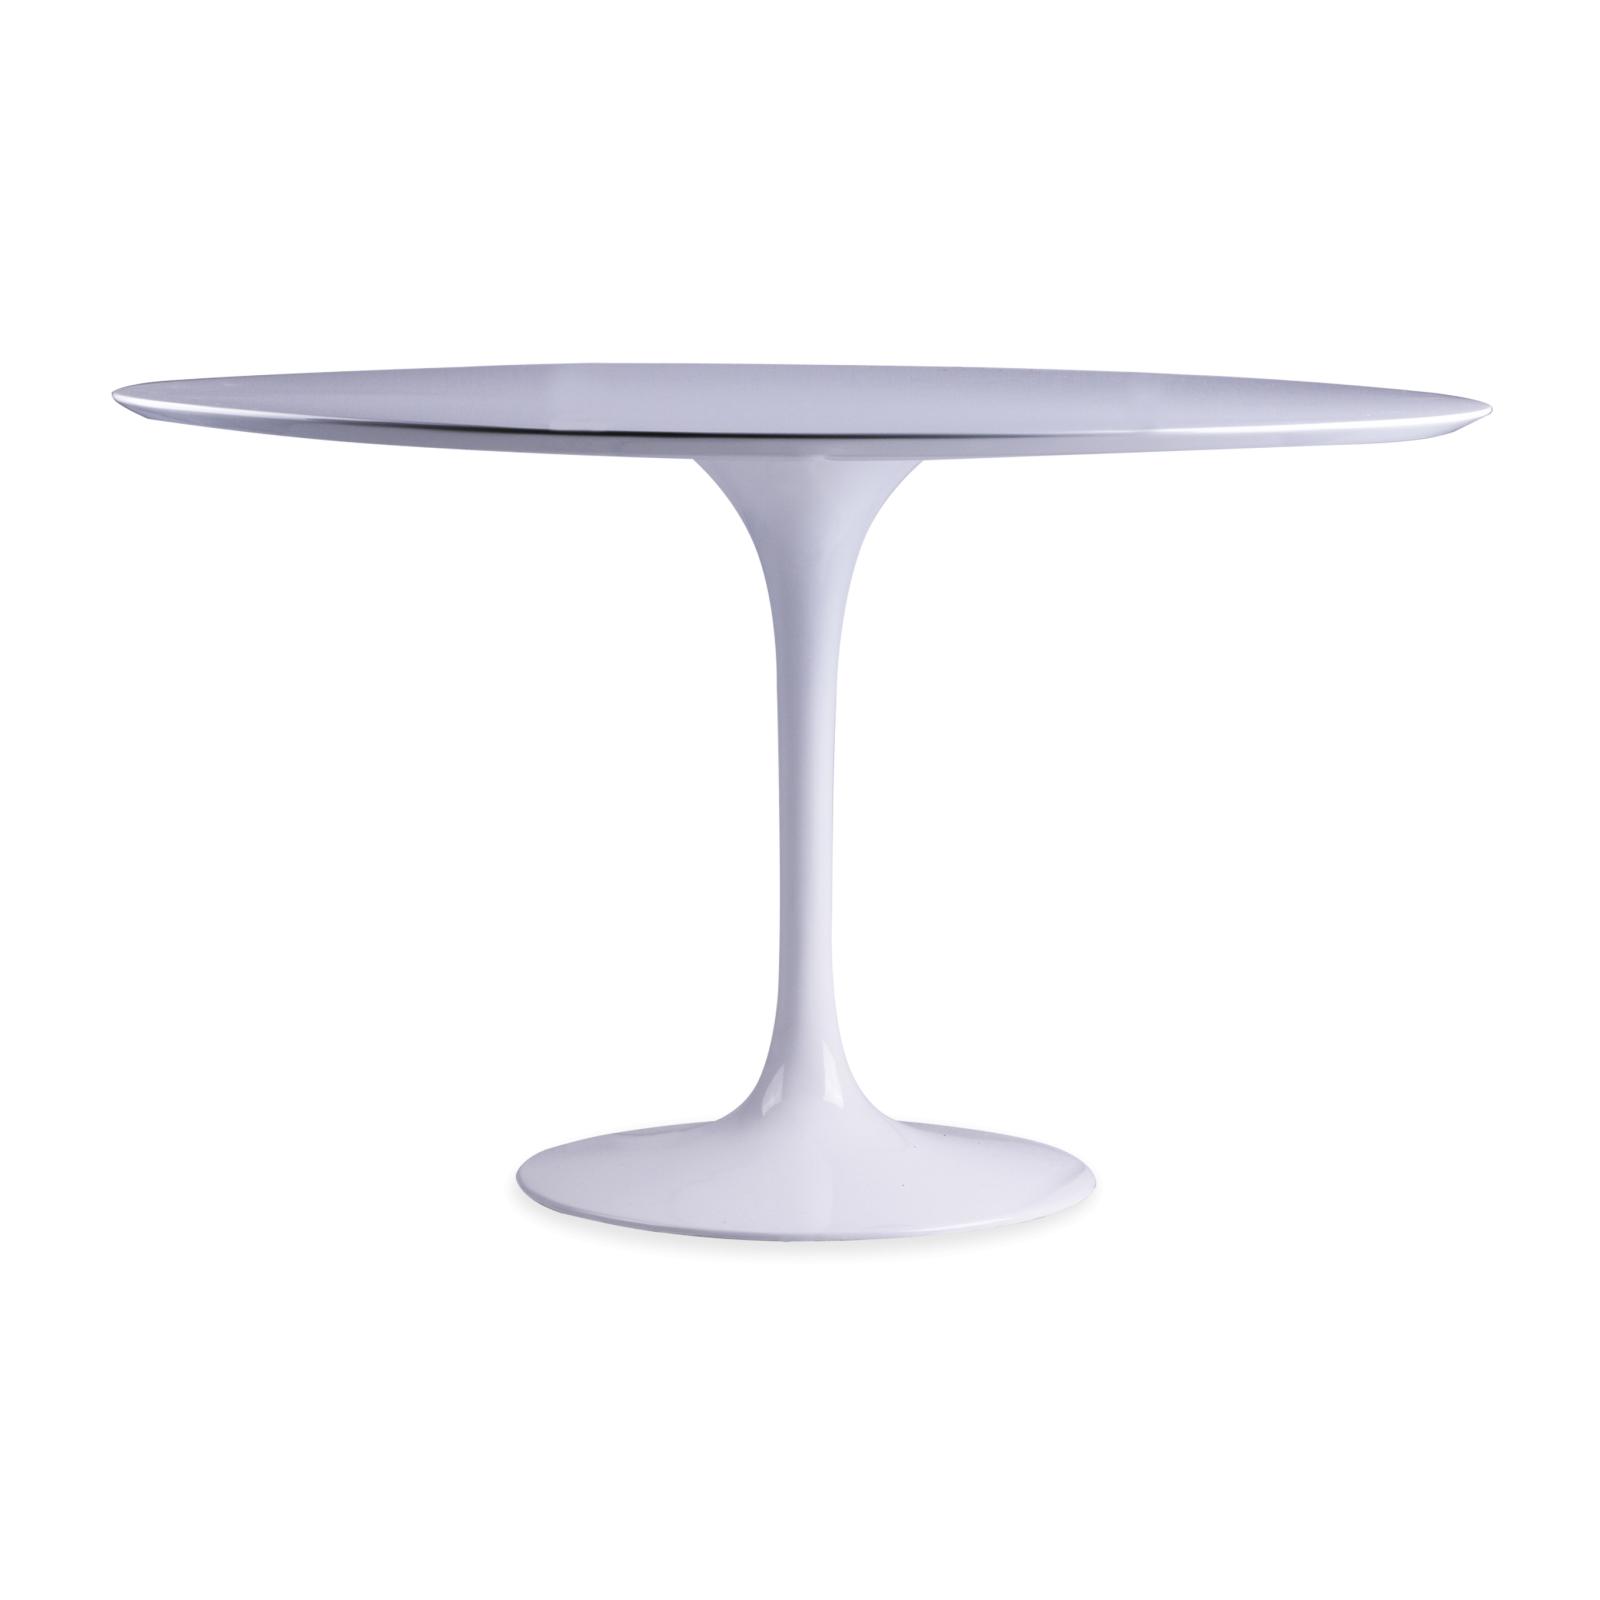 Table Tulipe Saarinen Table Ronde Design Voga Idees Pour La